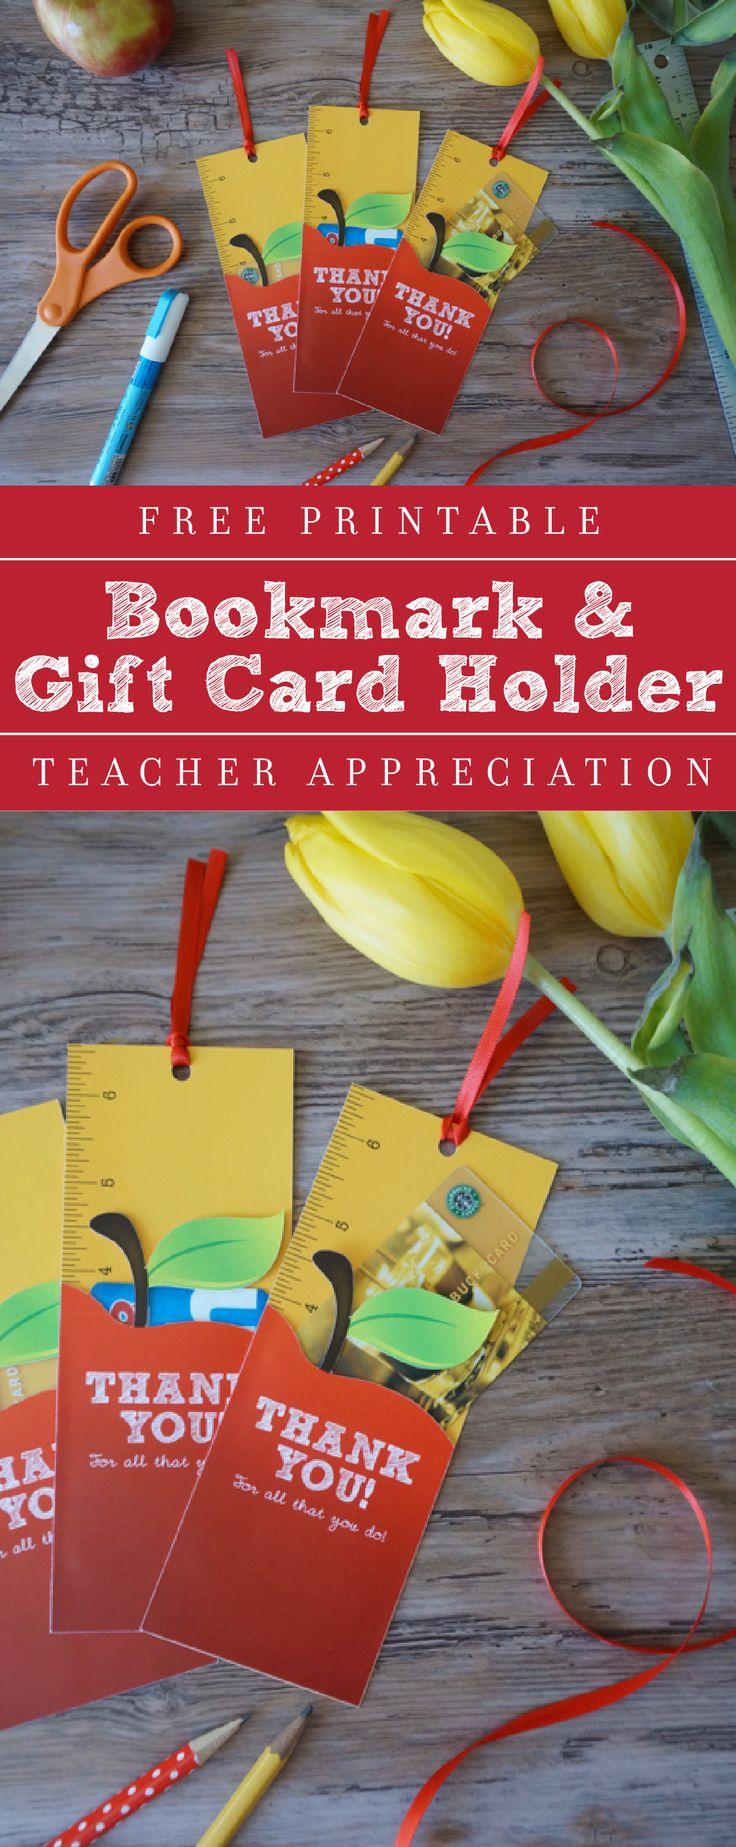 Scrapbook ideas for teachers - Free Printable Teacher Gift